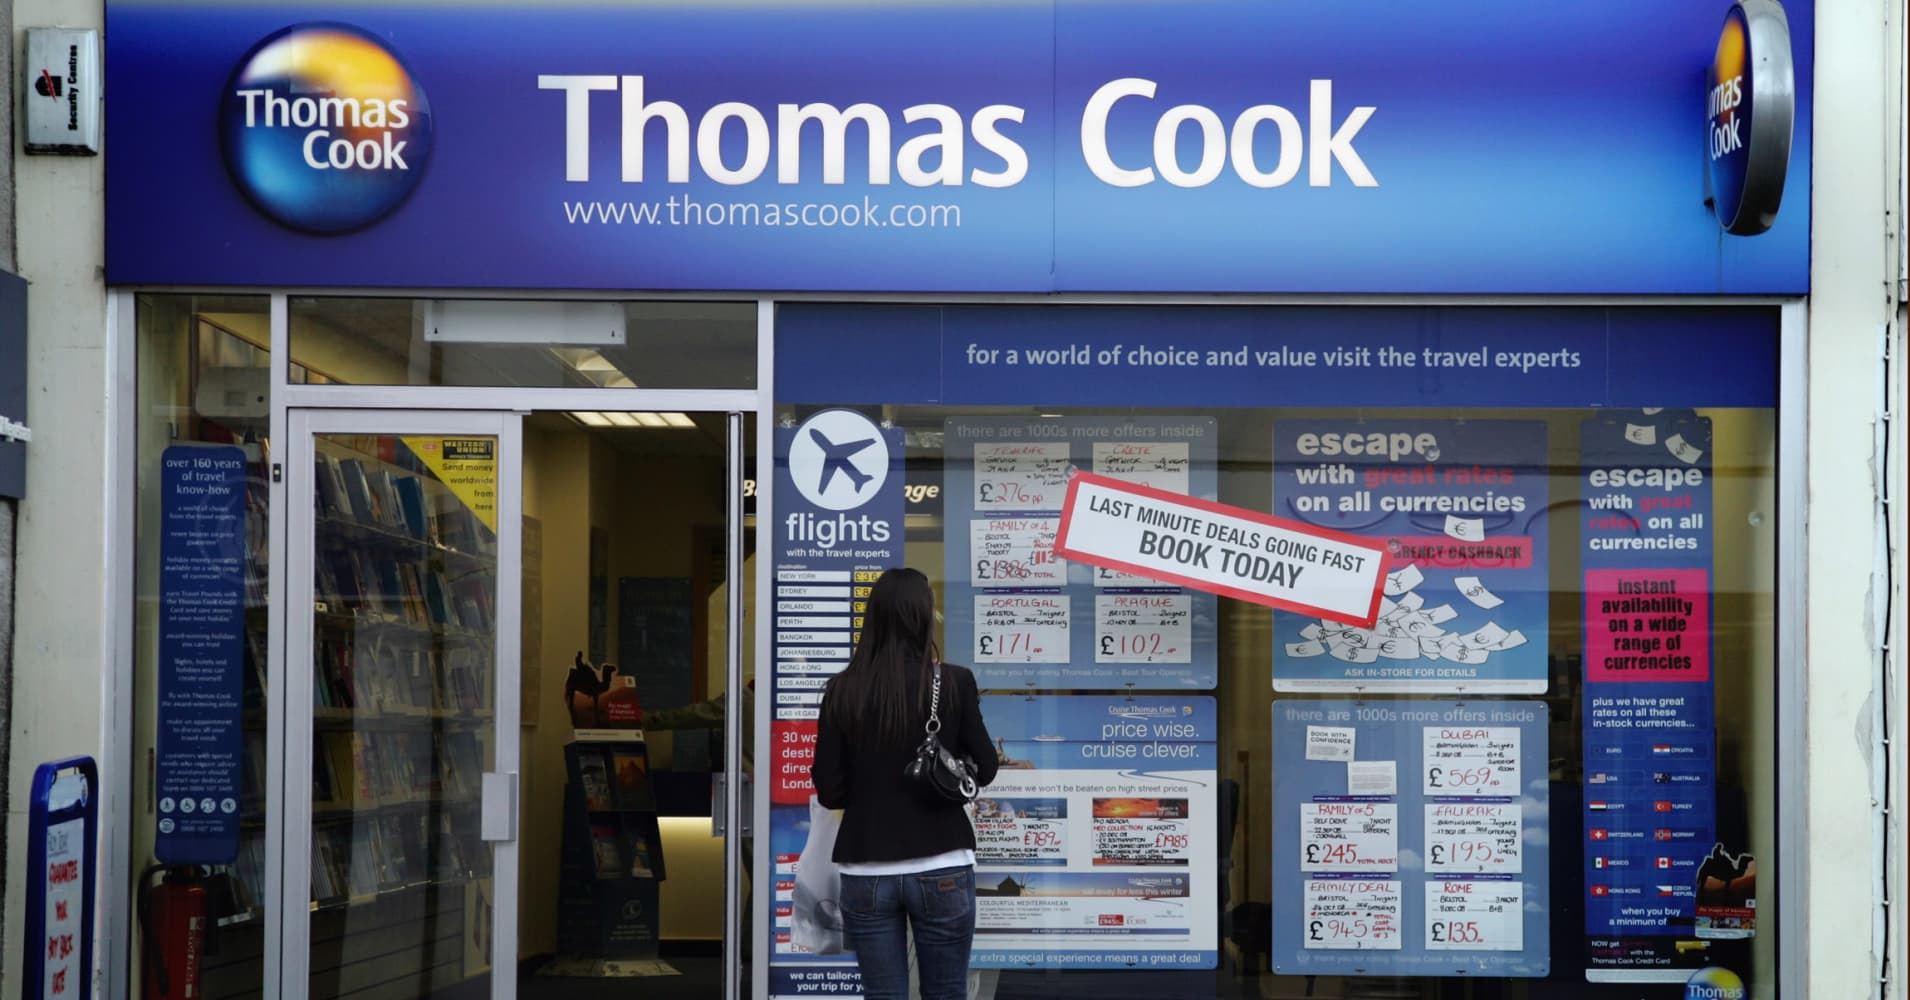 Thomas Cook cuts profit forecast again due to weak British market